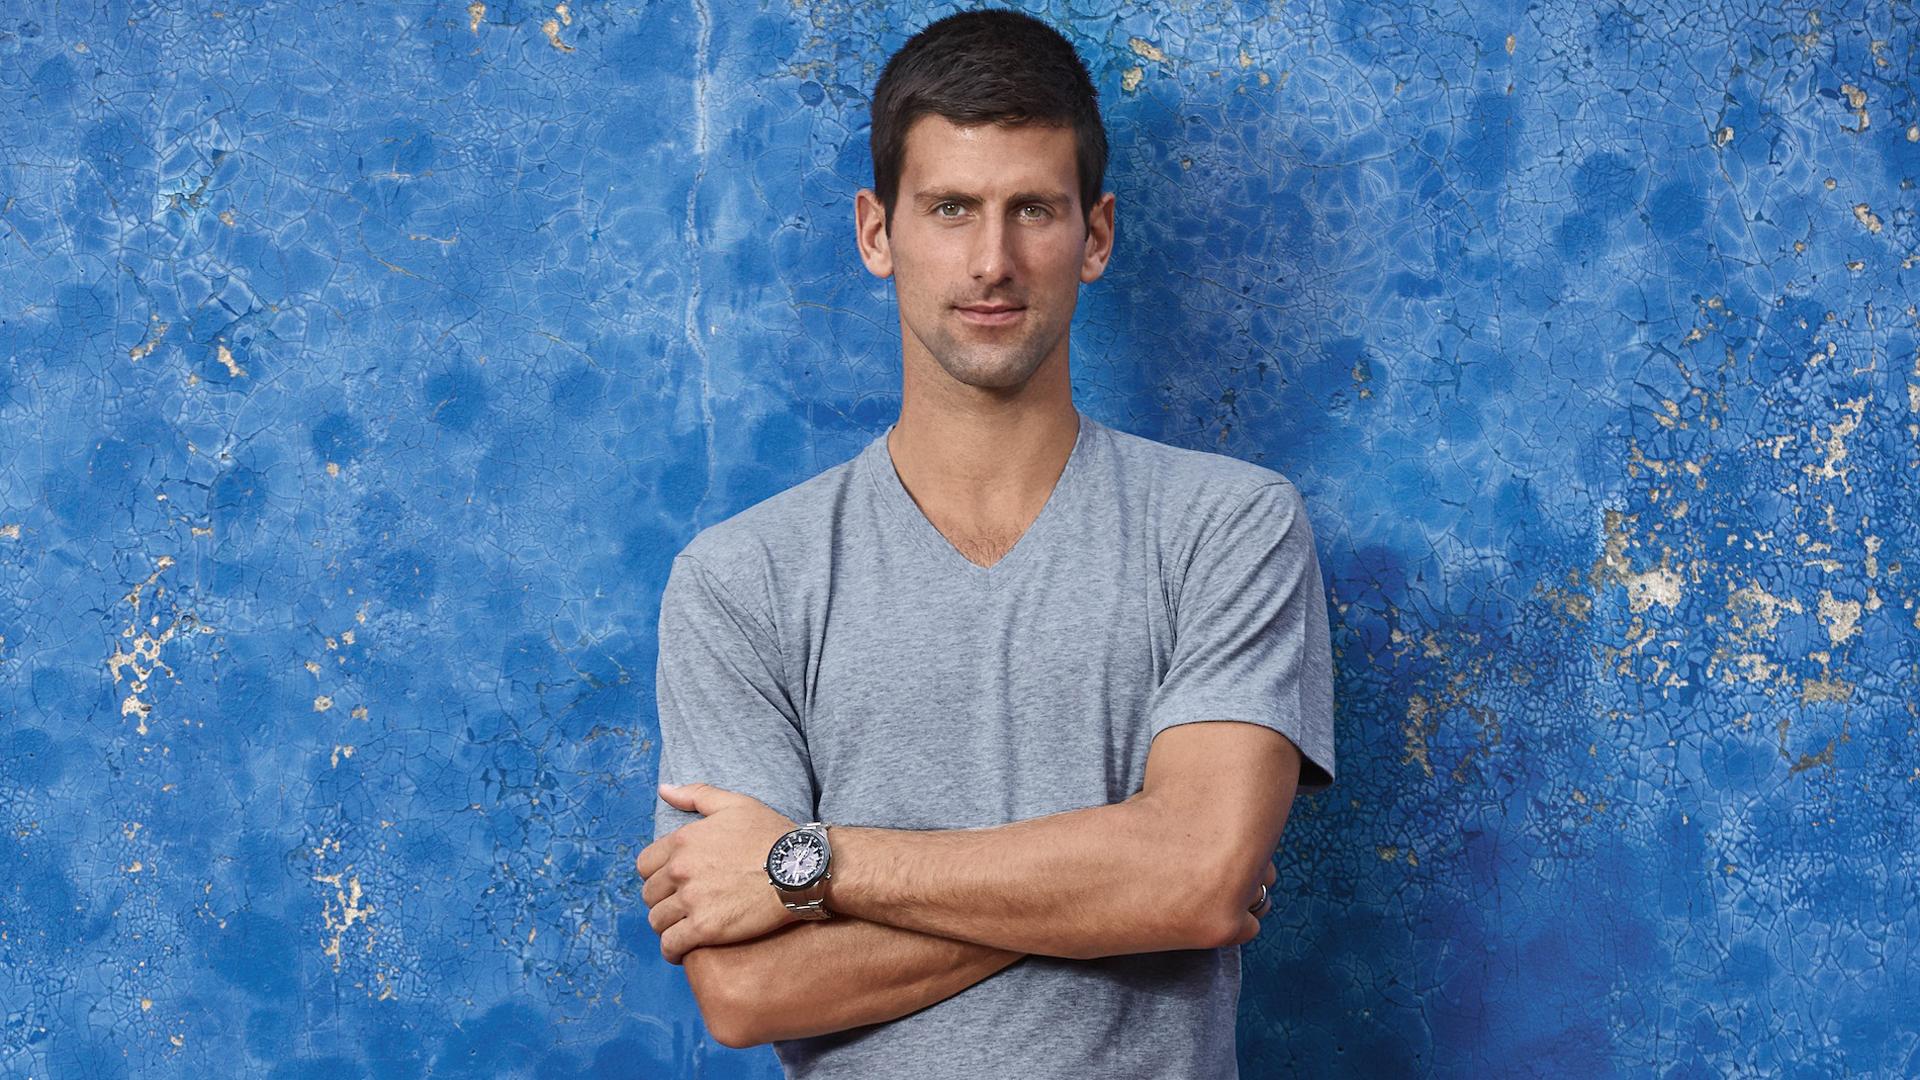 HD Novak Djokovic Wallpapers HdCoolWallpapersCom 1920x1080